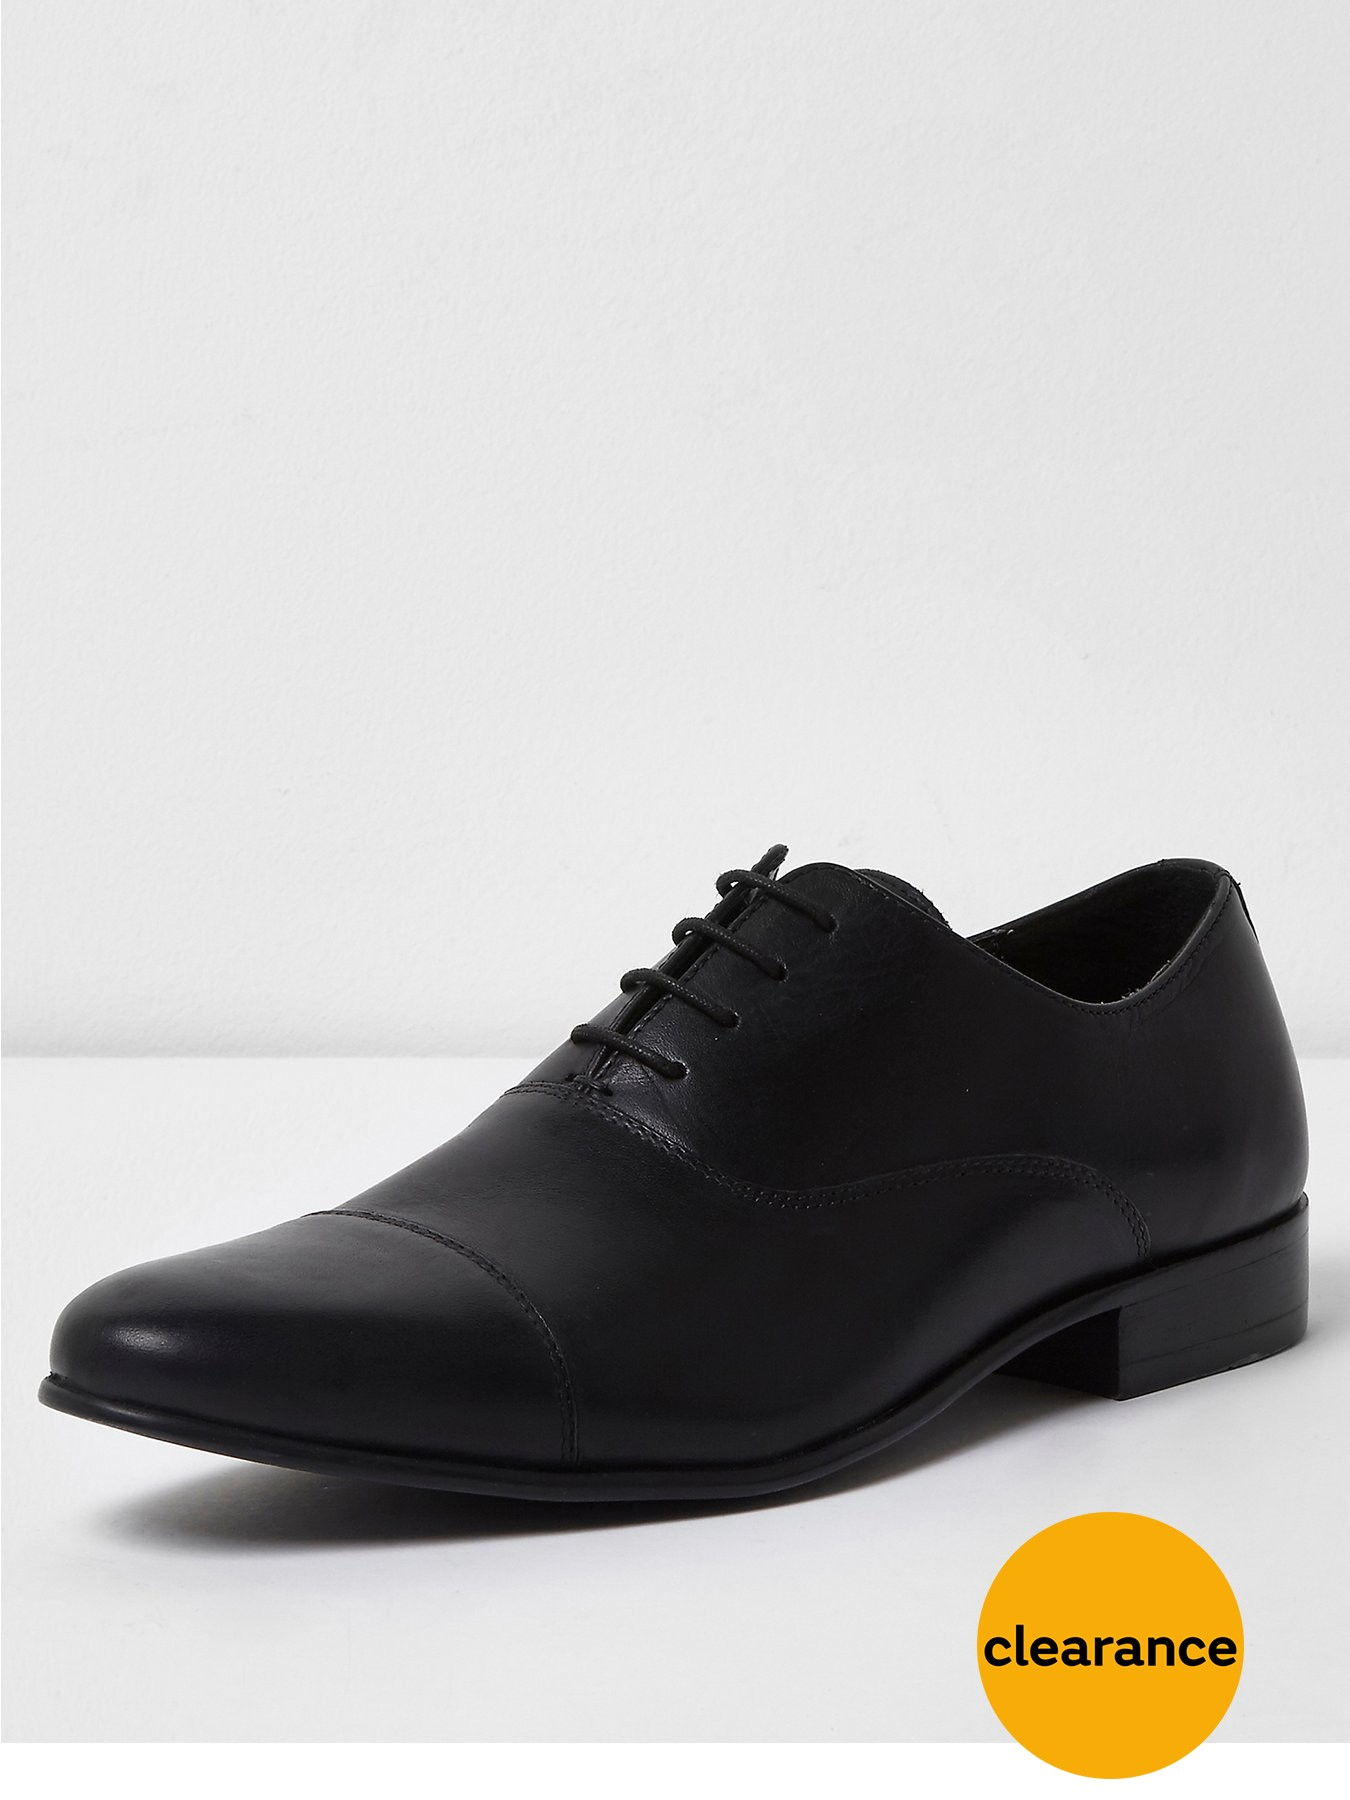 River Island Raynes Toecap Perf Shoe 1600181083 Men's Shoes River Island Shoes